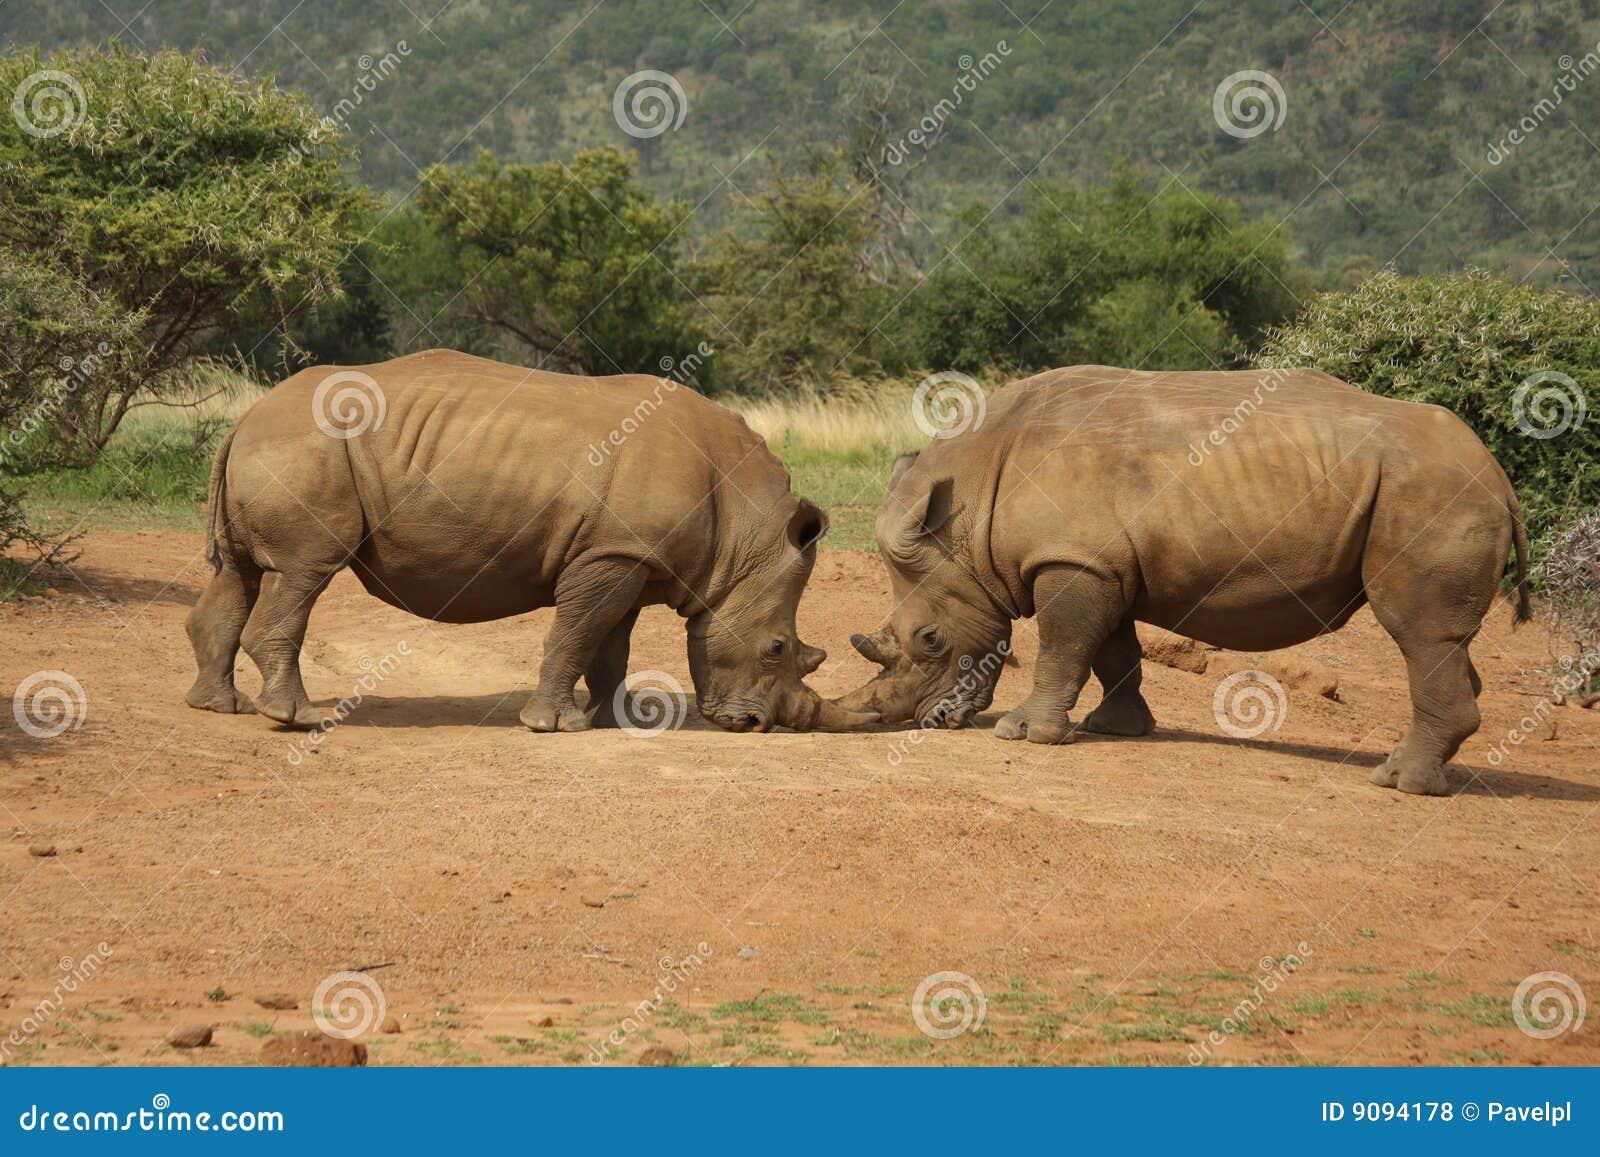 Fighting Rhinos, South Africa